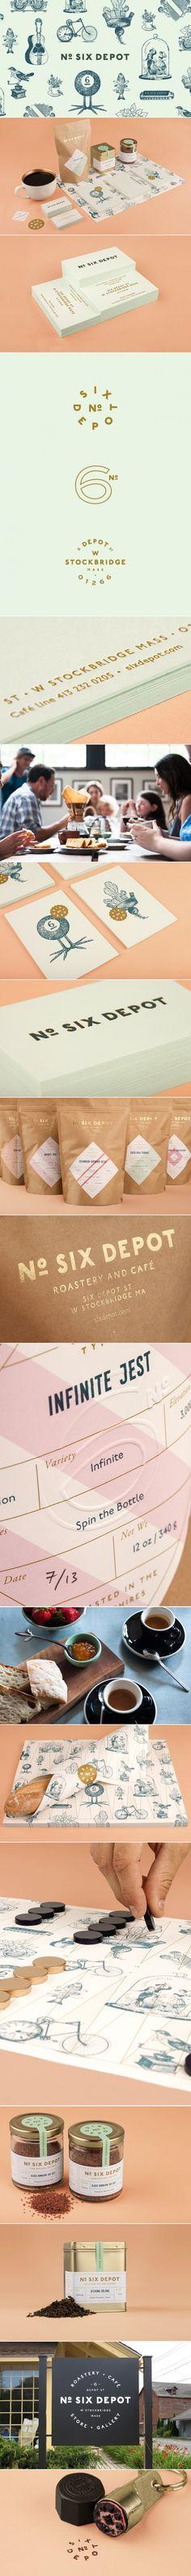 No. Six Depot Coffee Roaster & Cafe | Perky Bros.